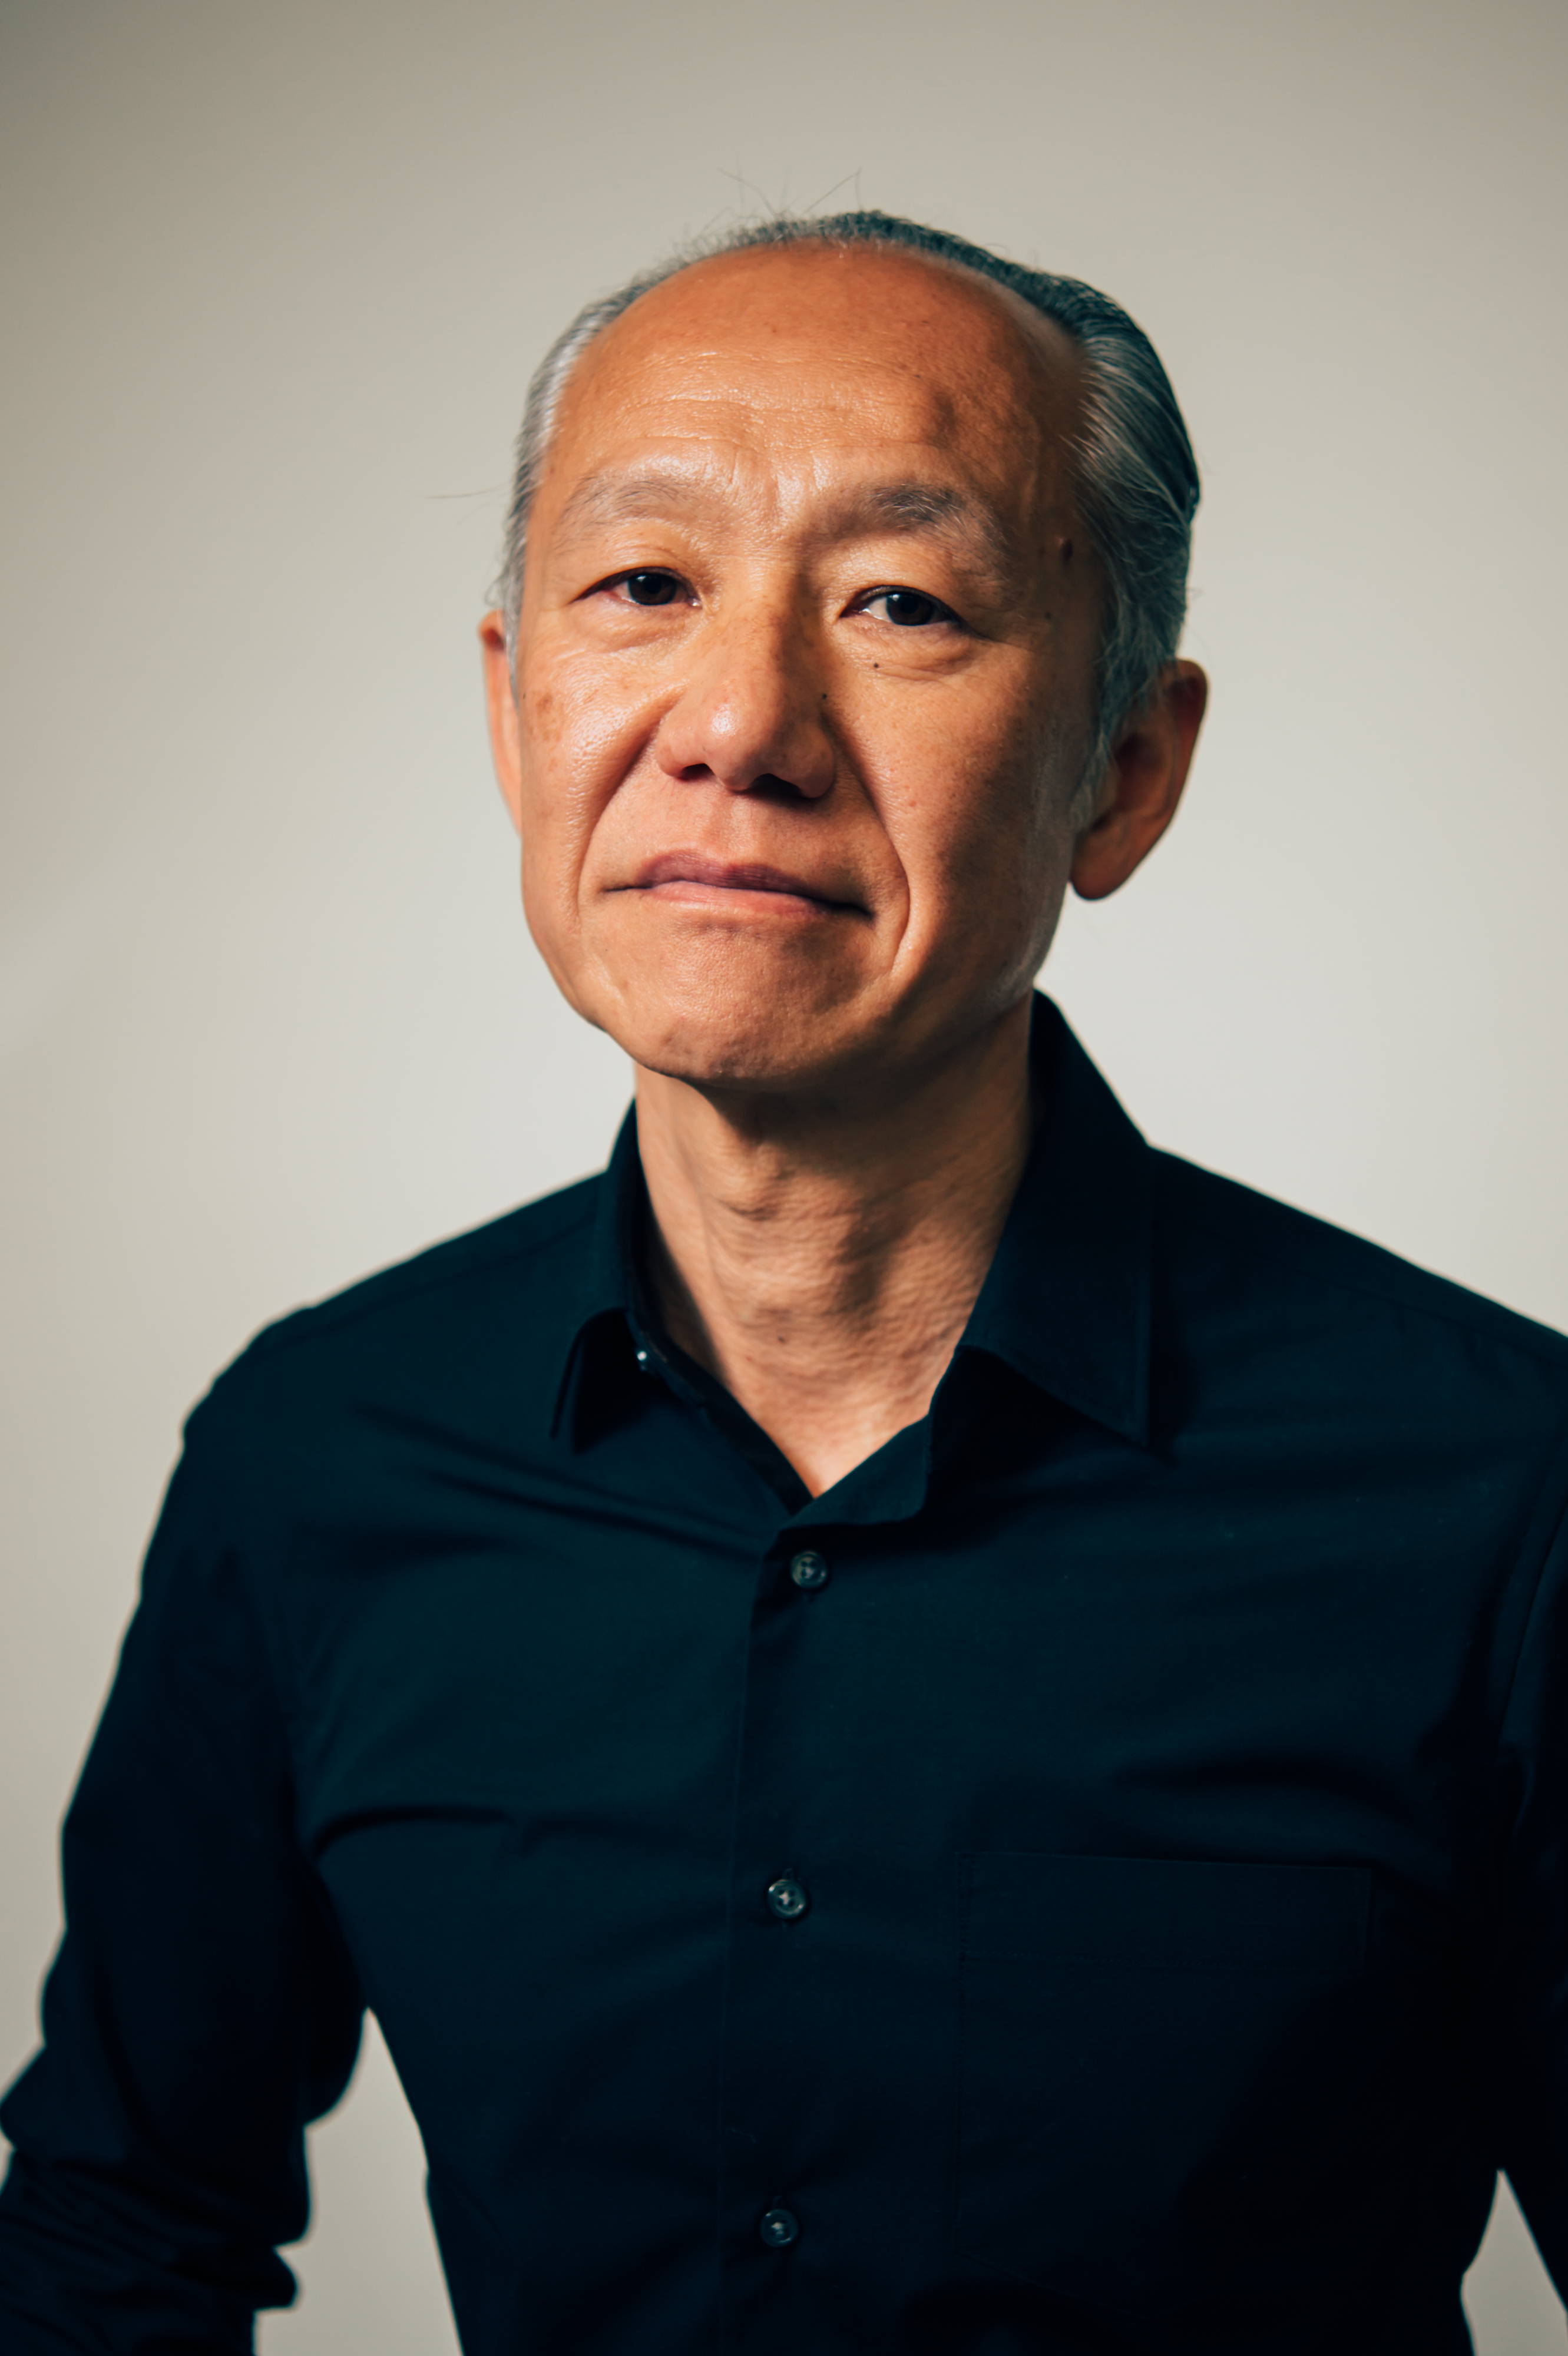 室山 和廣 Kazuhiro Muroyama - Actor